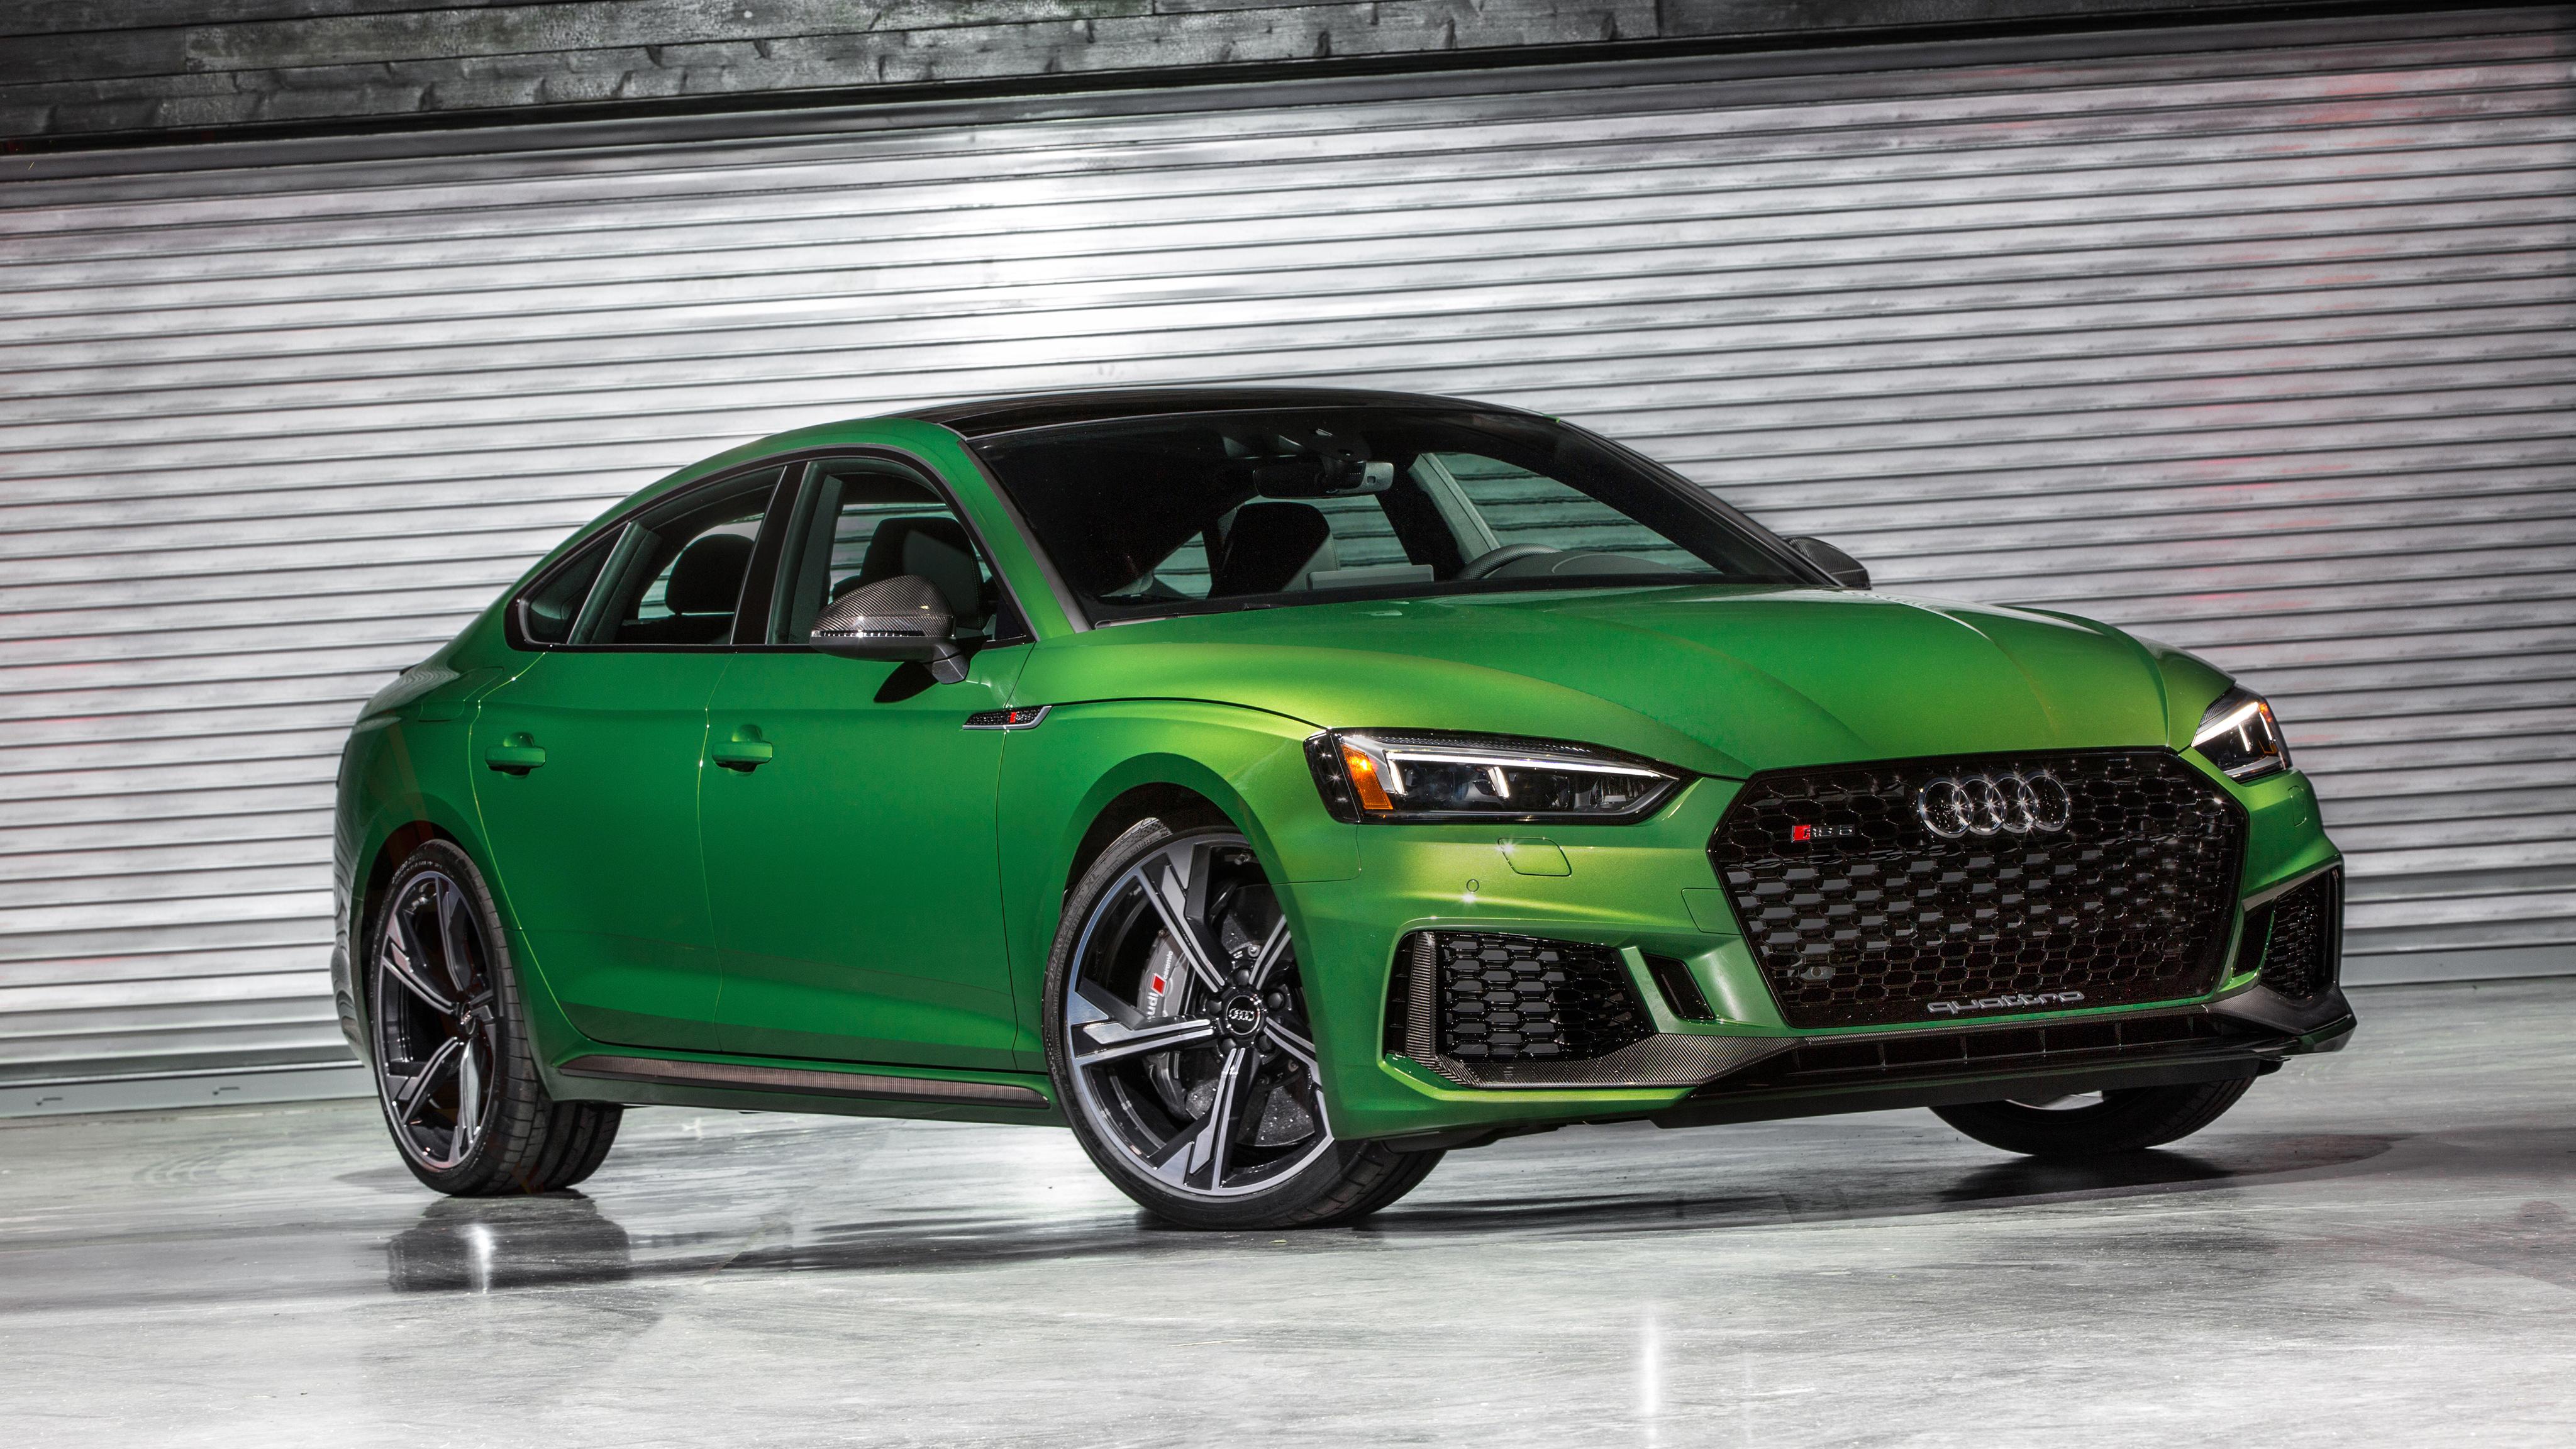 2019 Audi Rs5 Sportback 4k Wallpaper Hd Car Wallpapers Id 10069